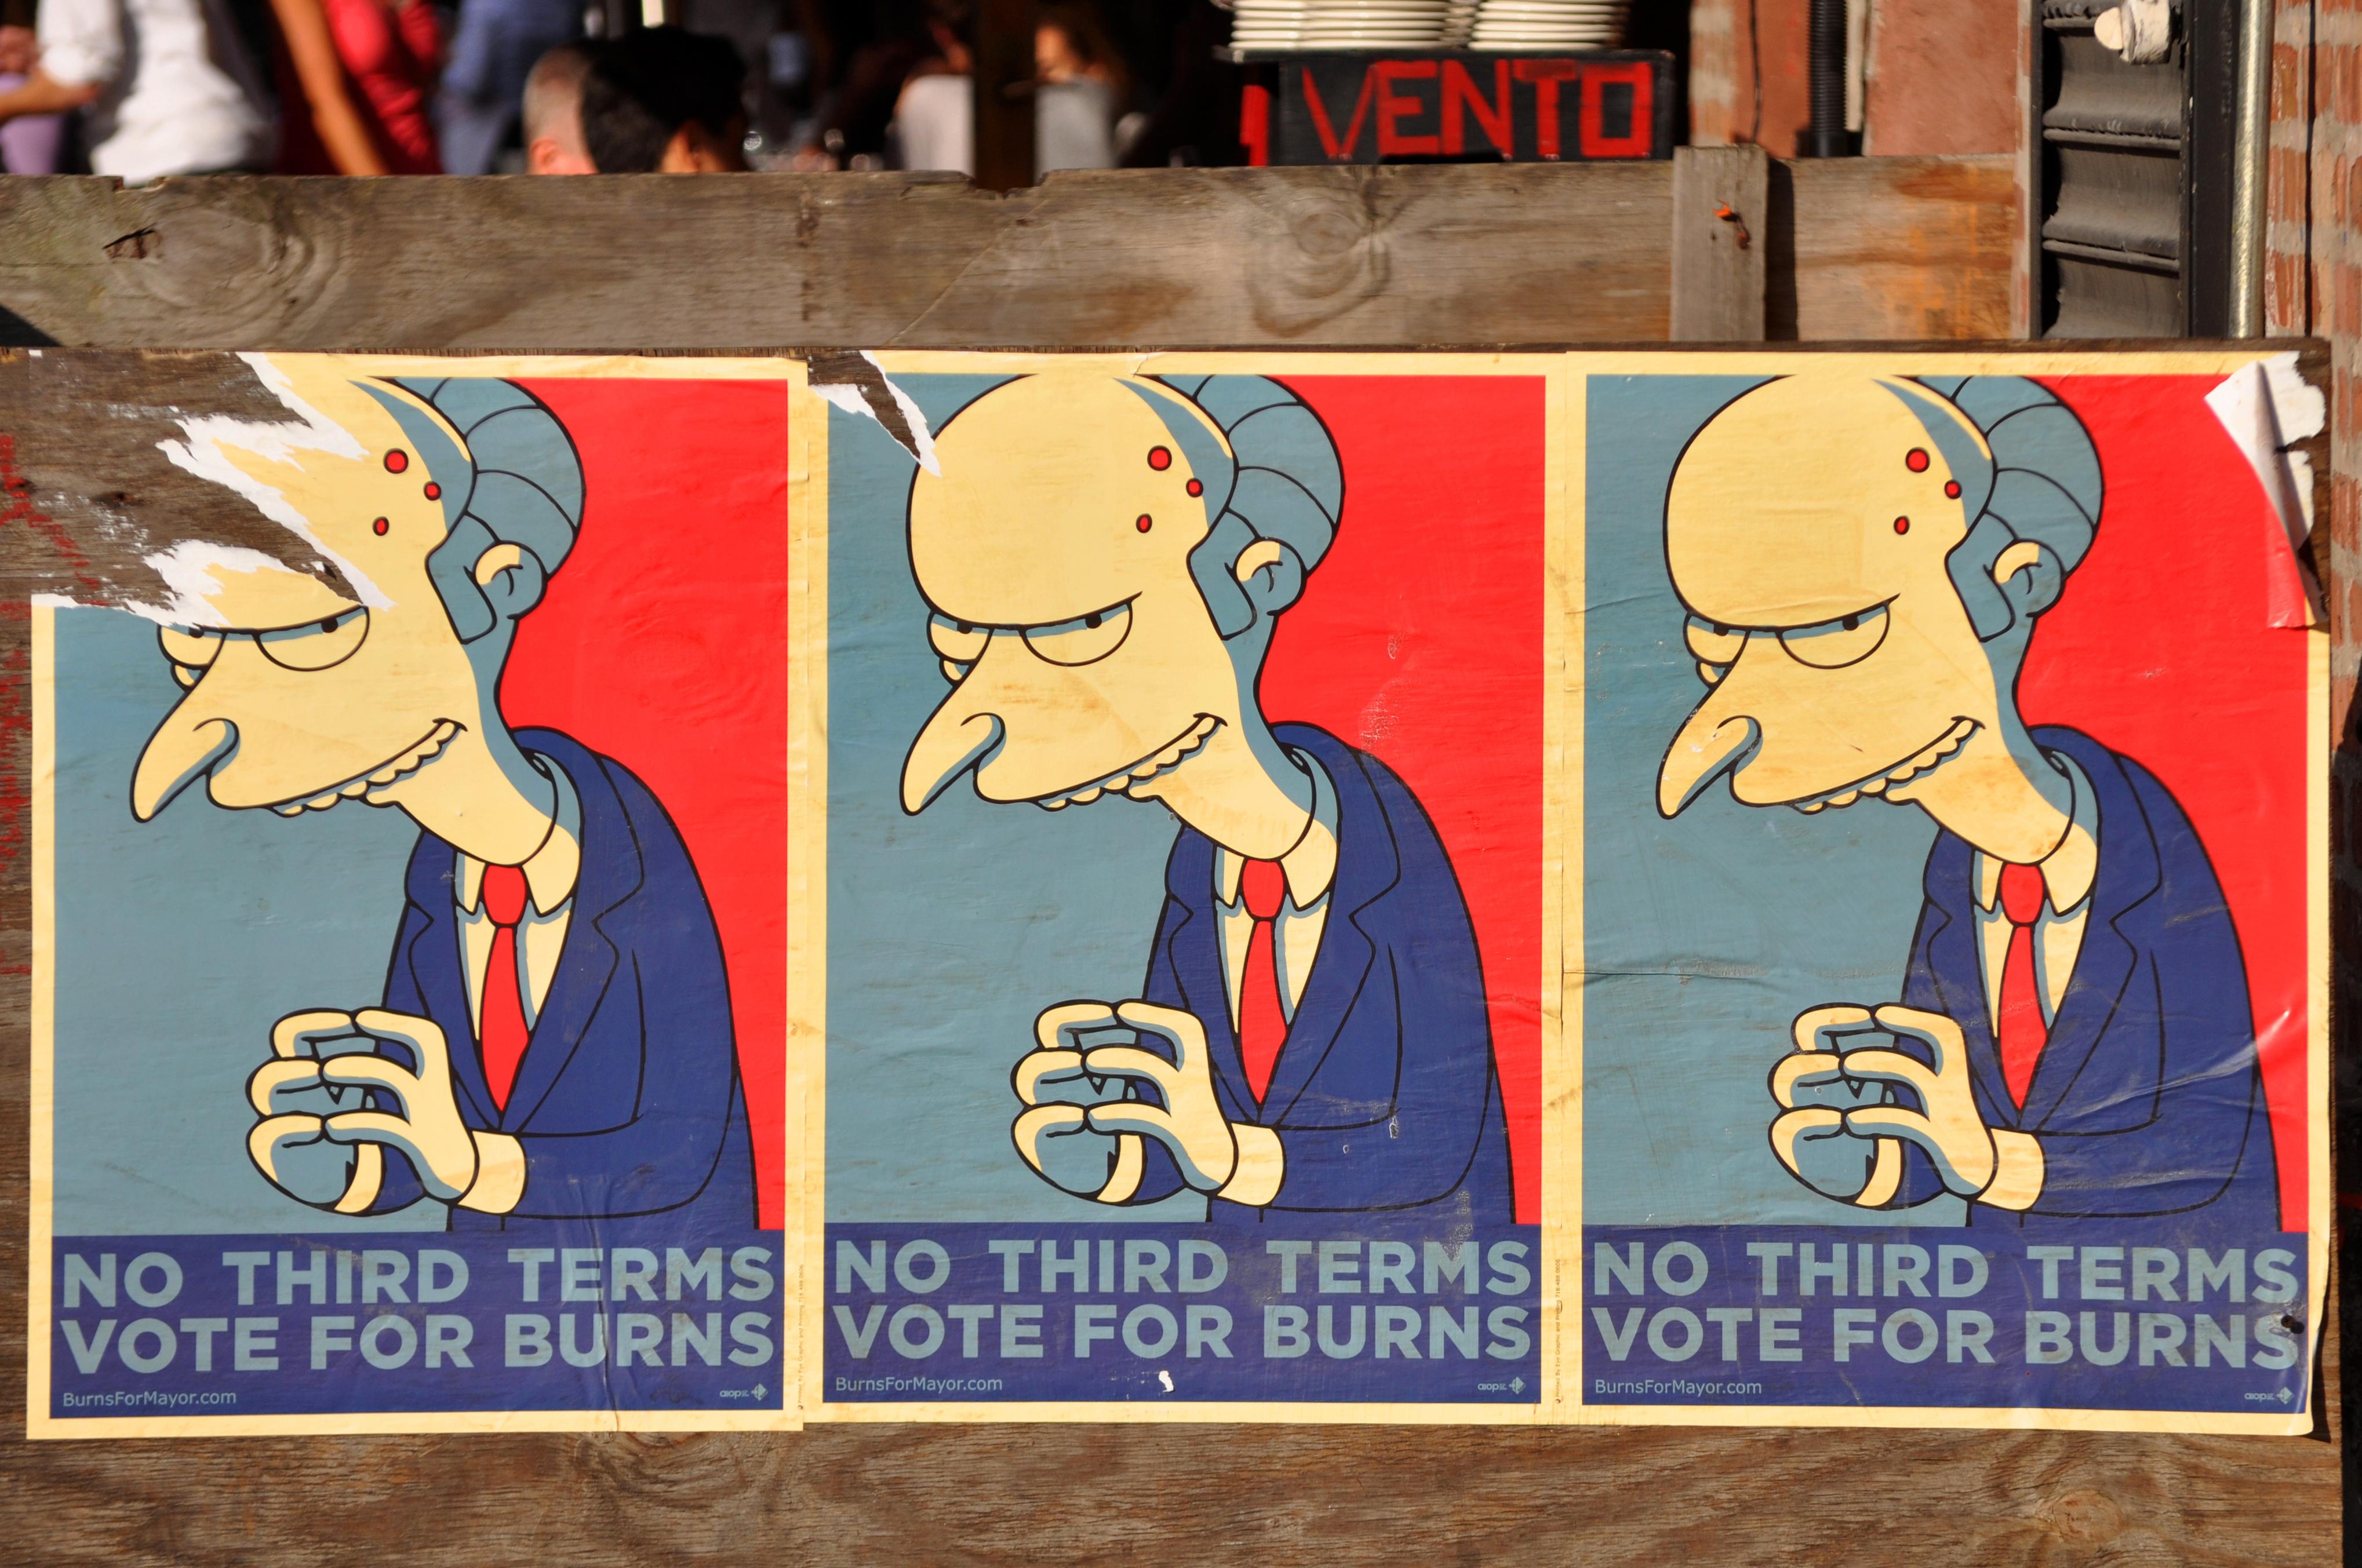 Vote for Burns. Foto: Ludovic Bertron. Izvor: https://www.flickr.com/photos/23912576@N05/3981899745/in/photolist-74Sh4T-fQFCw2-4nURYN-5zfmbV-nZufYF-6qAkk-8B6BRB-2GGaM-8QaFrS-7iqW-rPNHd-4KaMk7-5xyTuC-q1tibZ-5aRVjn-6hdL8D-291MPY-8QfLxQ-aBfzyD-93tsnR-6atoxn-5ycqEA-rMpQF-rLHfE-4quuCS-e1vaNW-7BcXP4-72n9Lp-bB82gA-8PVuu9-6q3Wc-fjNXKj-5BMq3S-4qhg4k-5sPJwk-jnnMV8-8Q9NPn-68WVhn-5zmjHc-rLrhm-jdUDb-pECkv7-5zbHU8-99syjo-4xVDxB-4ZS2X9-5pZg8F-5wXPXr-99syk5-akancs